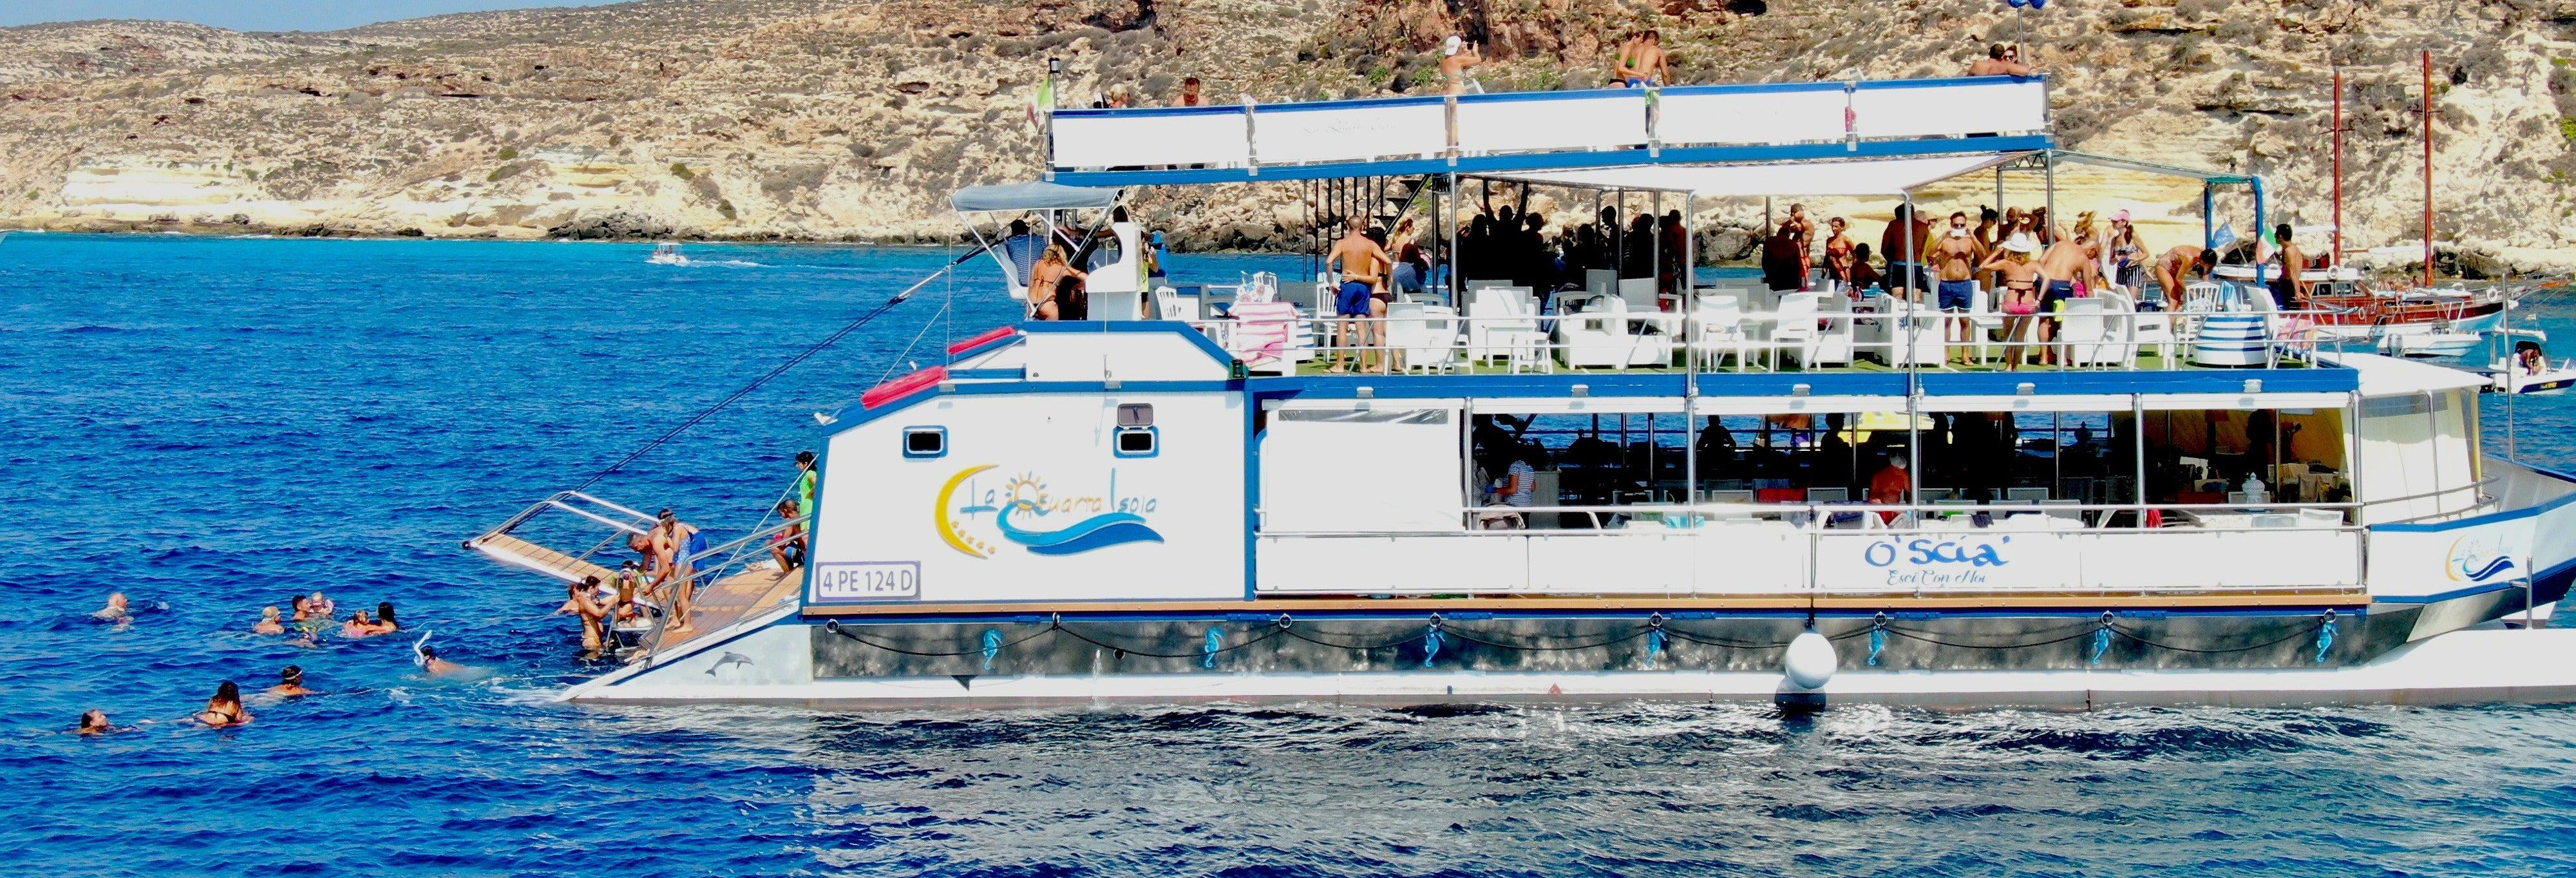 Crociera a Lampedusa